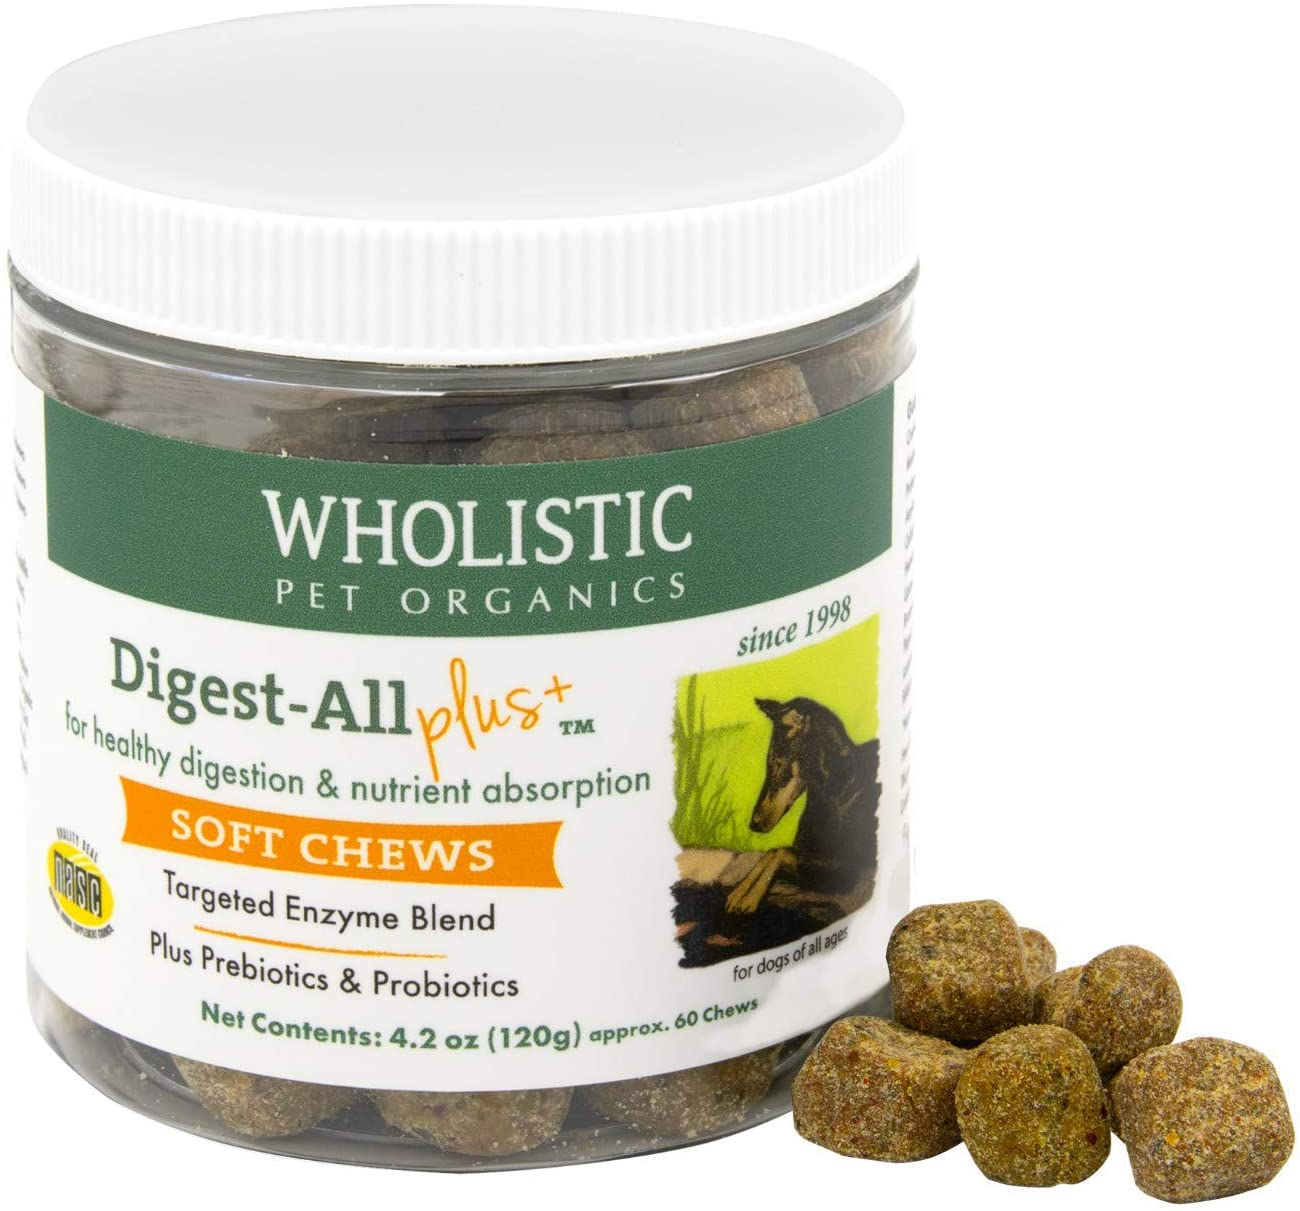 Wholistic Pet Organics Digest-All Plus Soft Chews Supplement